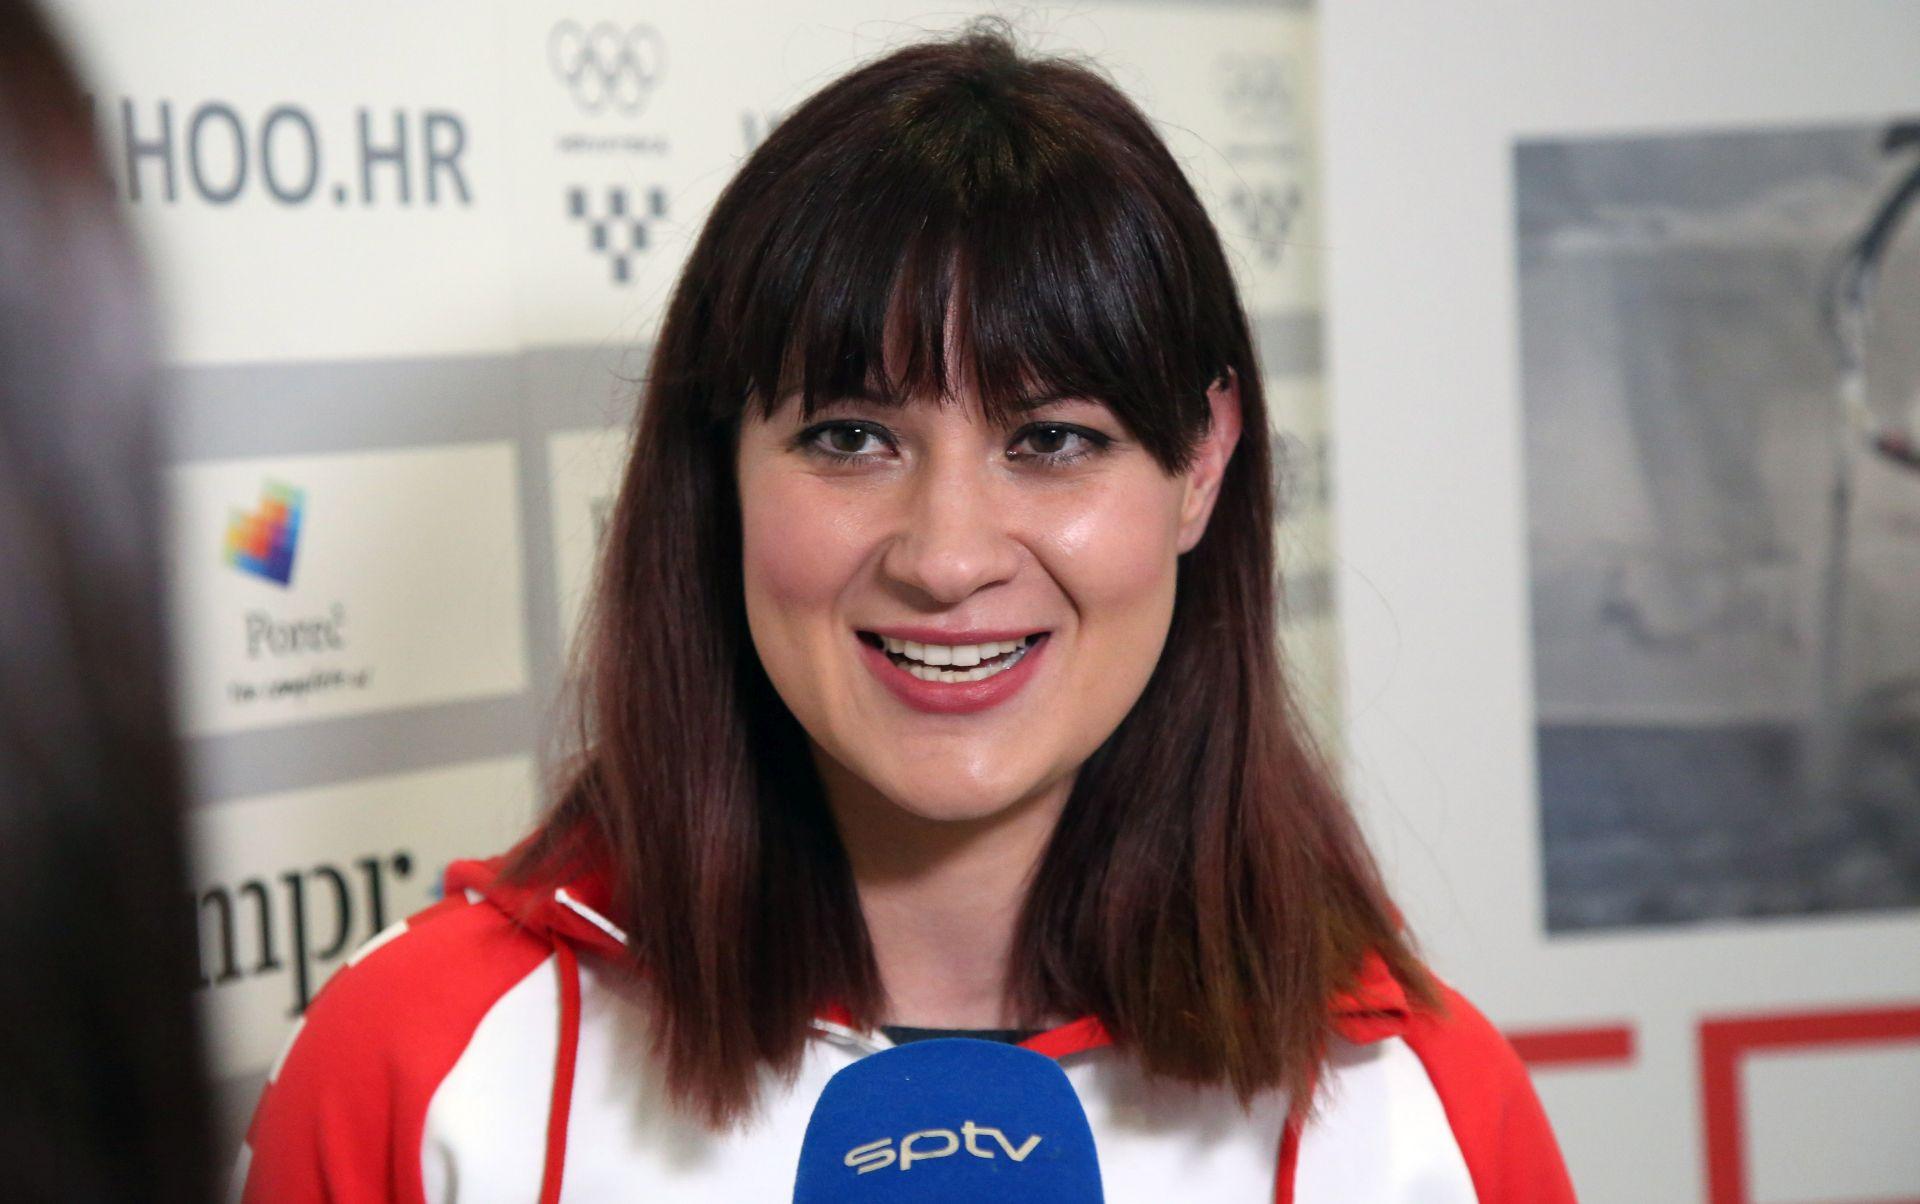 DARIA OBRATOV 'Ostvarila sam svoj olimpijski san'